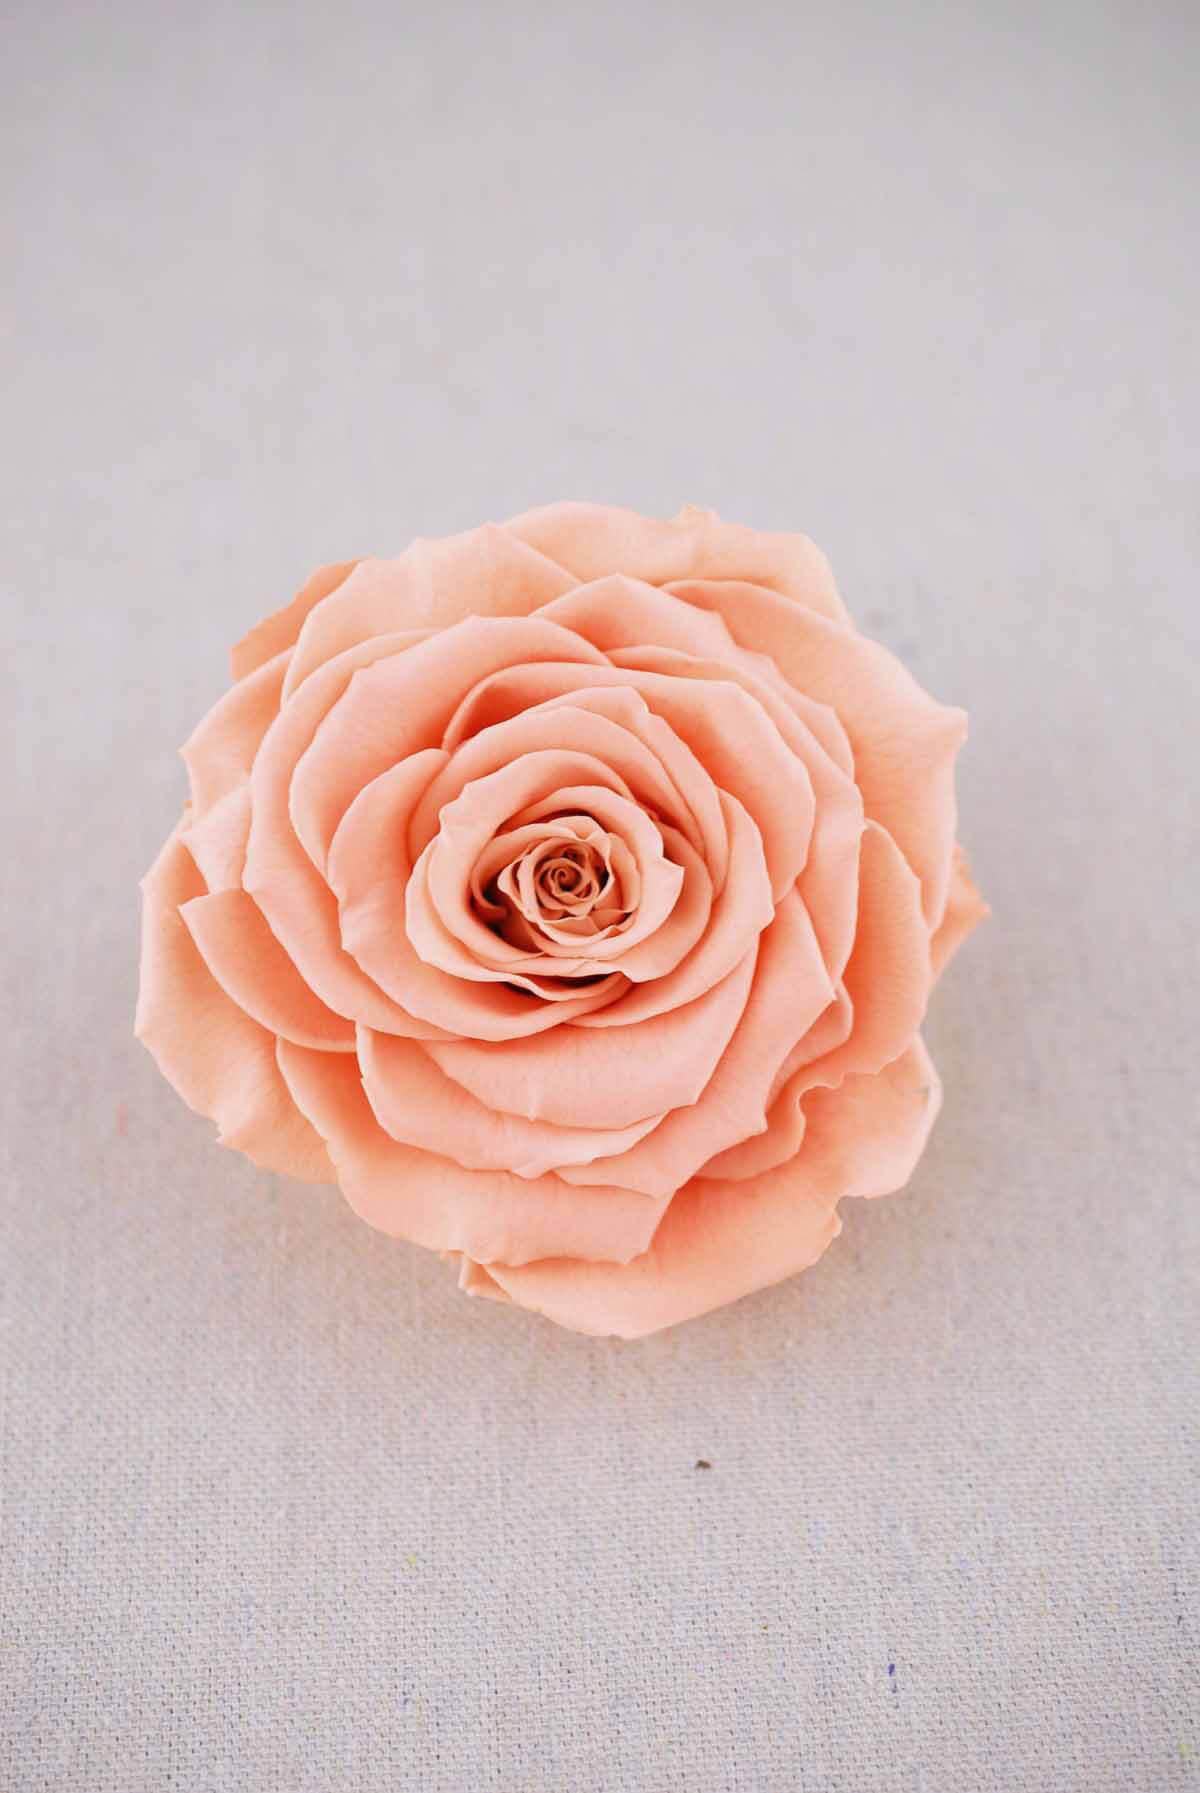 preserved roses 4 peach - Peach Garden Rose